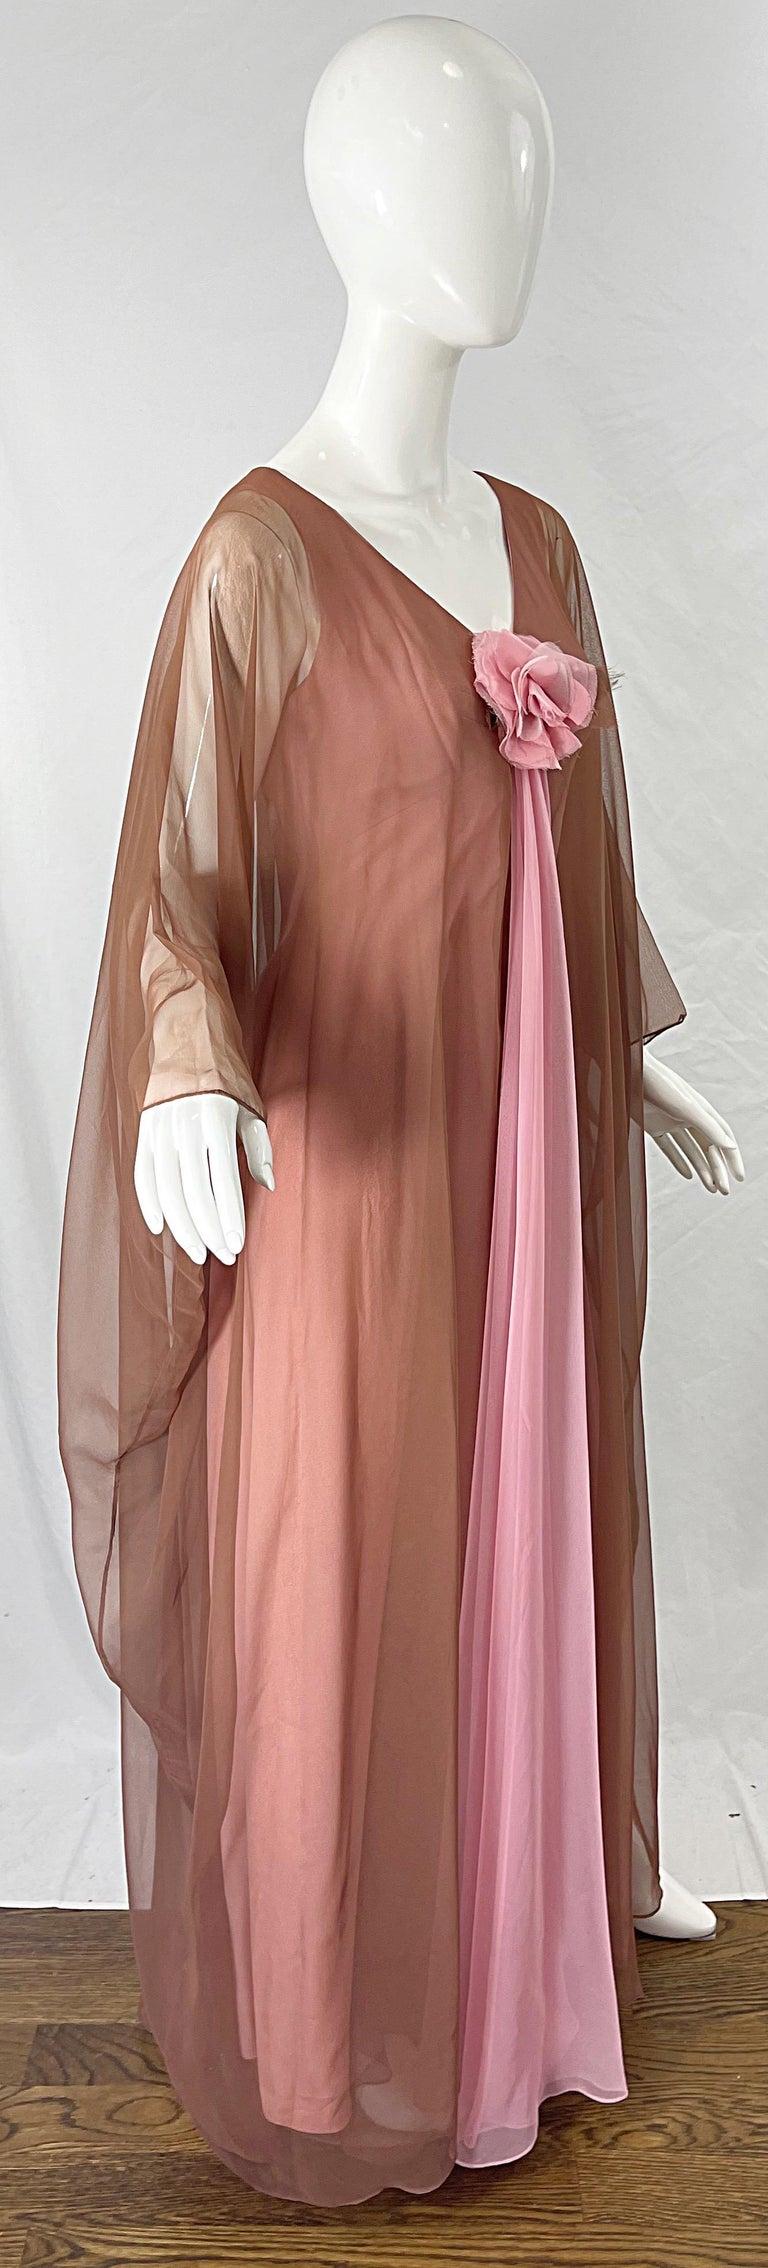 1970s Estevez Pink + Nude Brown Chiffon Caftan Vintage 70s Kaftan Maxi Dress For Sale 6